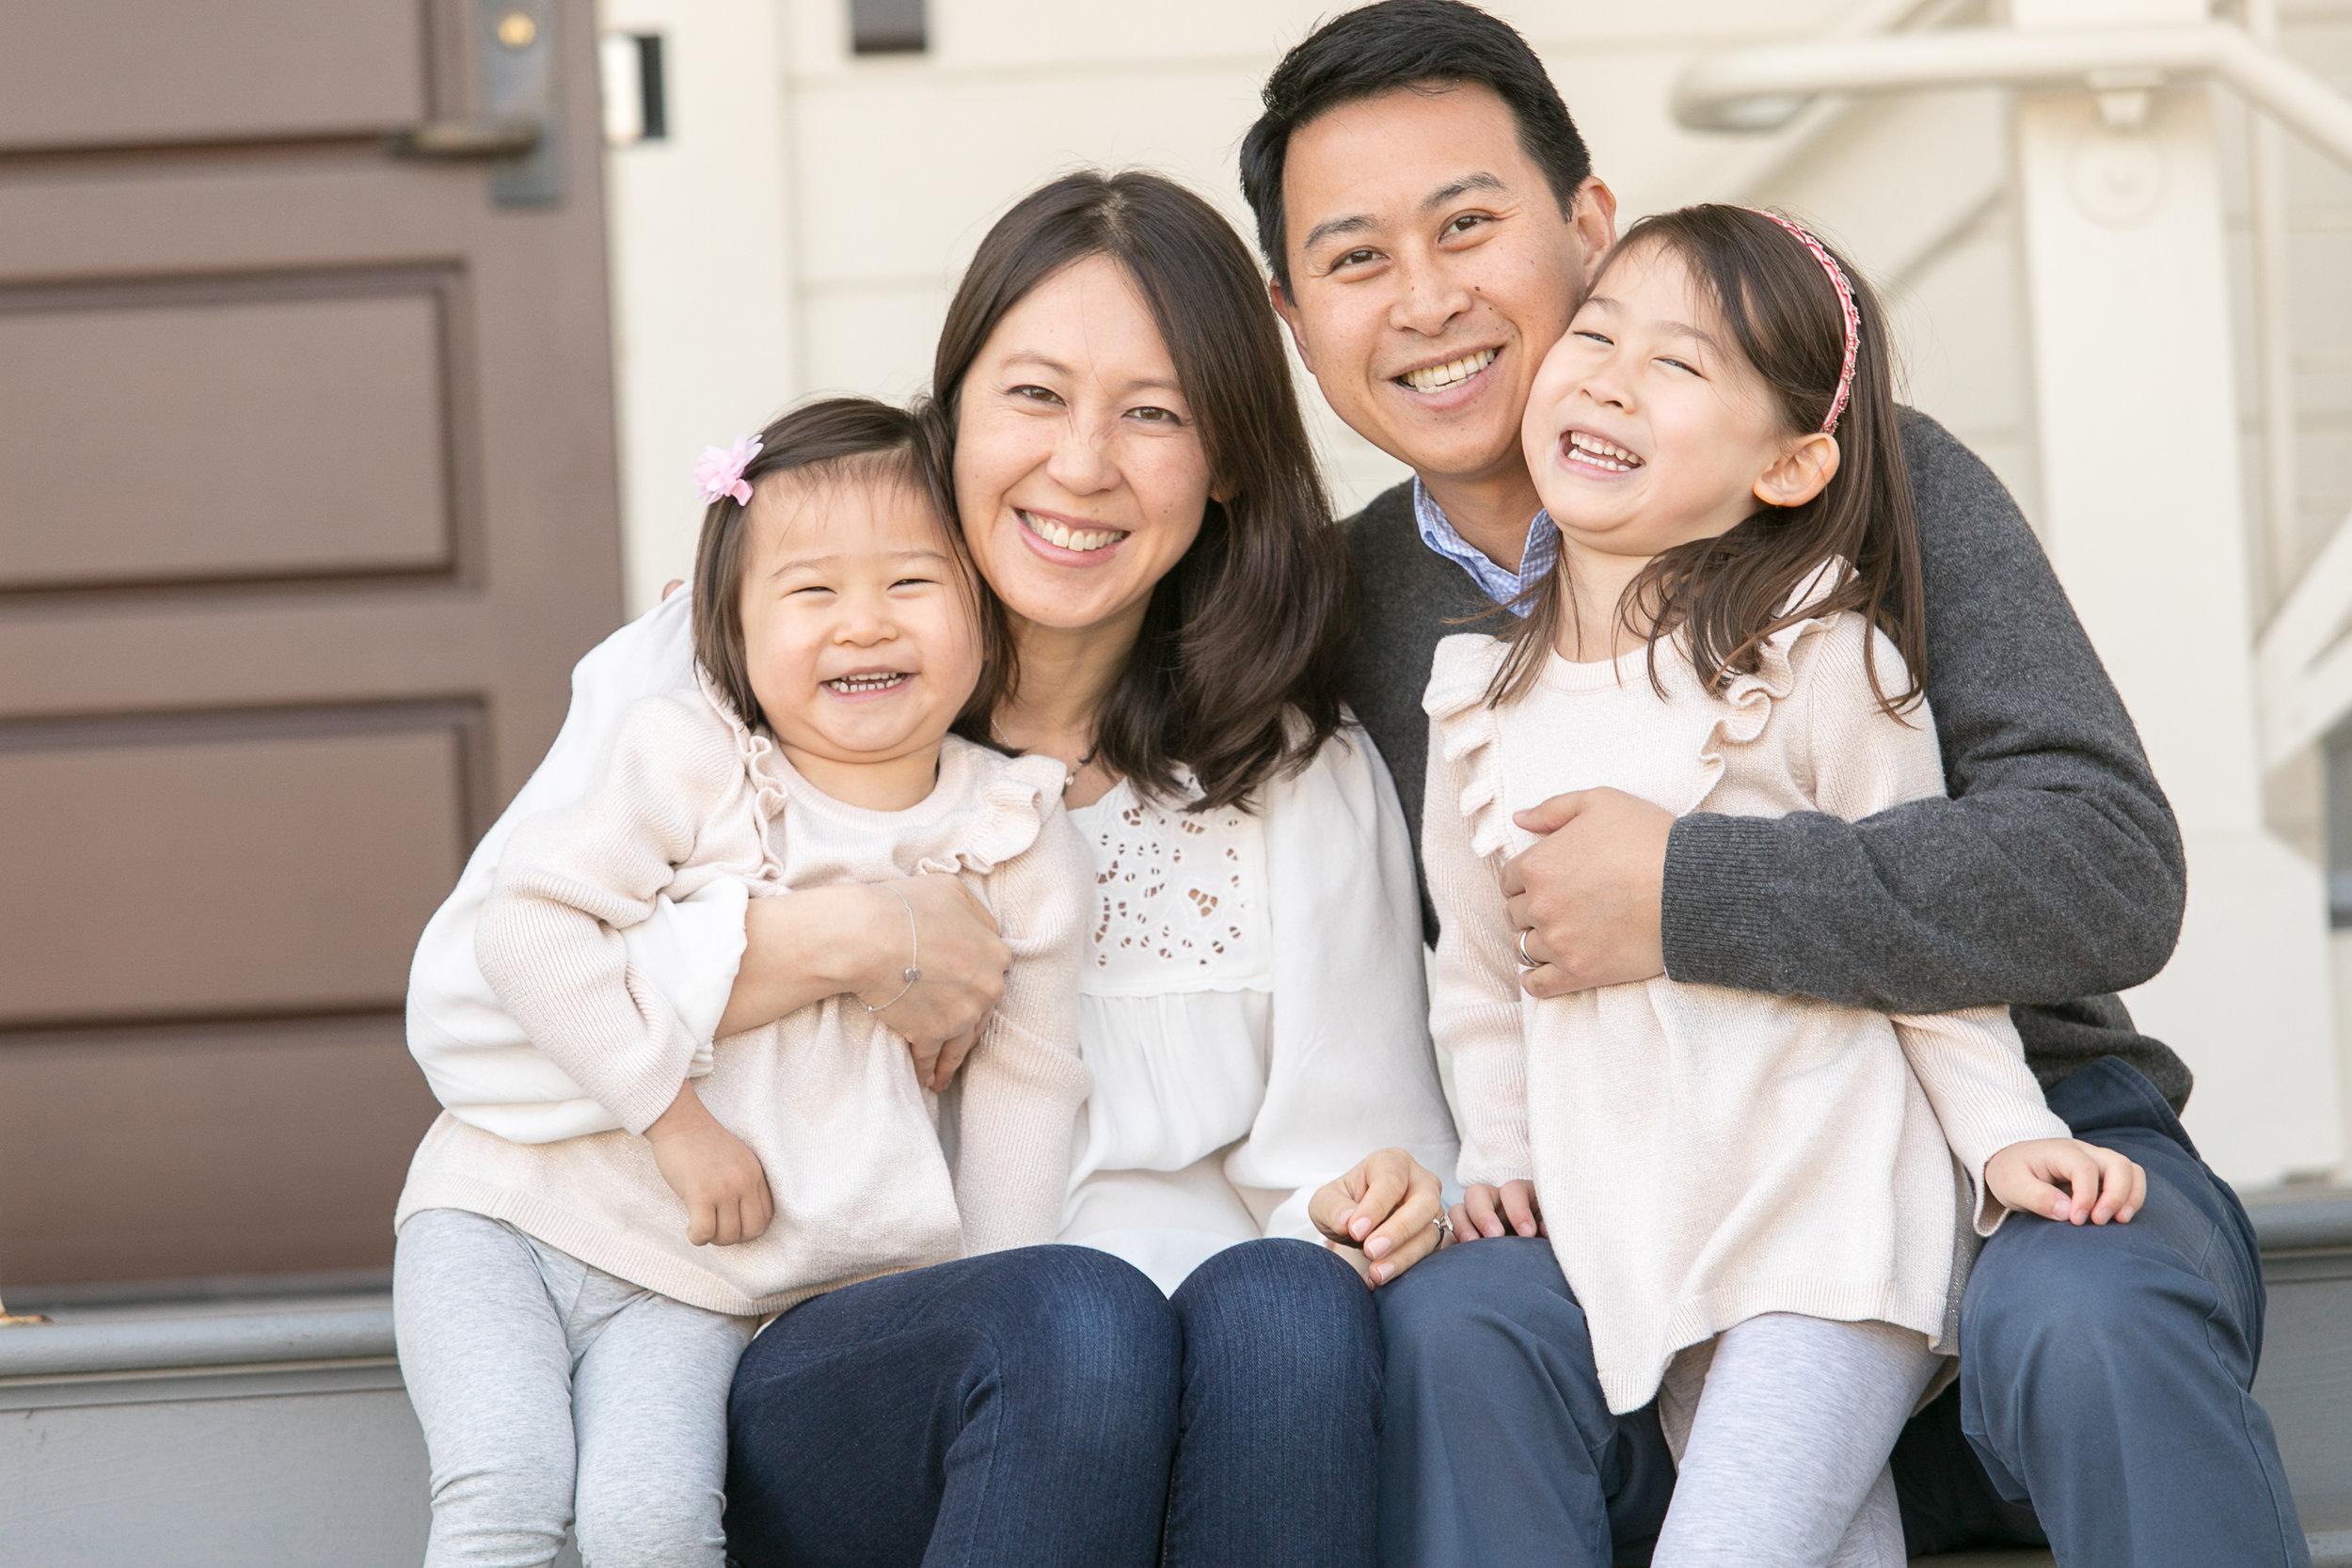 San_Francisco_Children_and_Family_Portrait_002.jpg